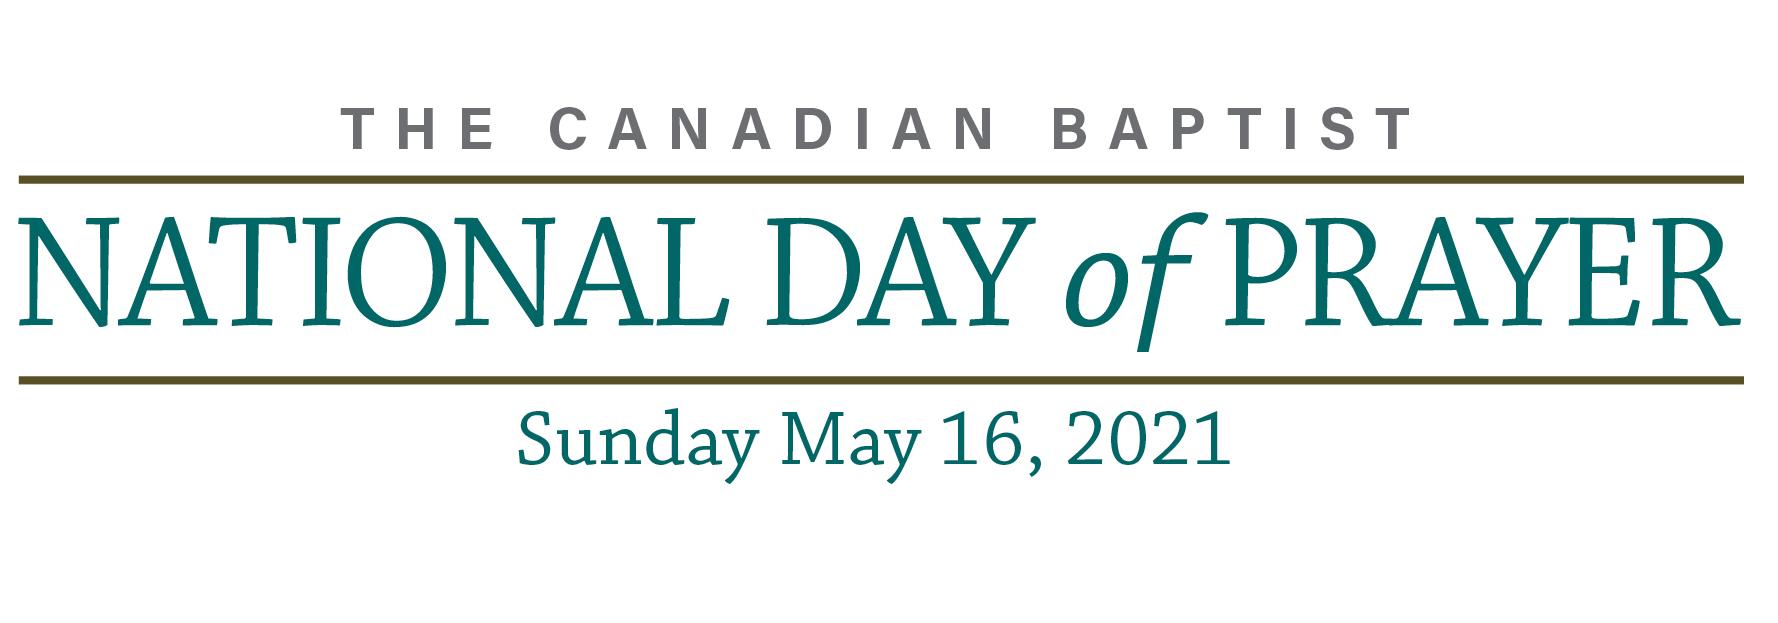 National Day of Prayer Logo